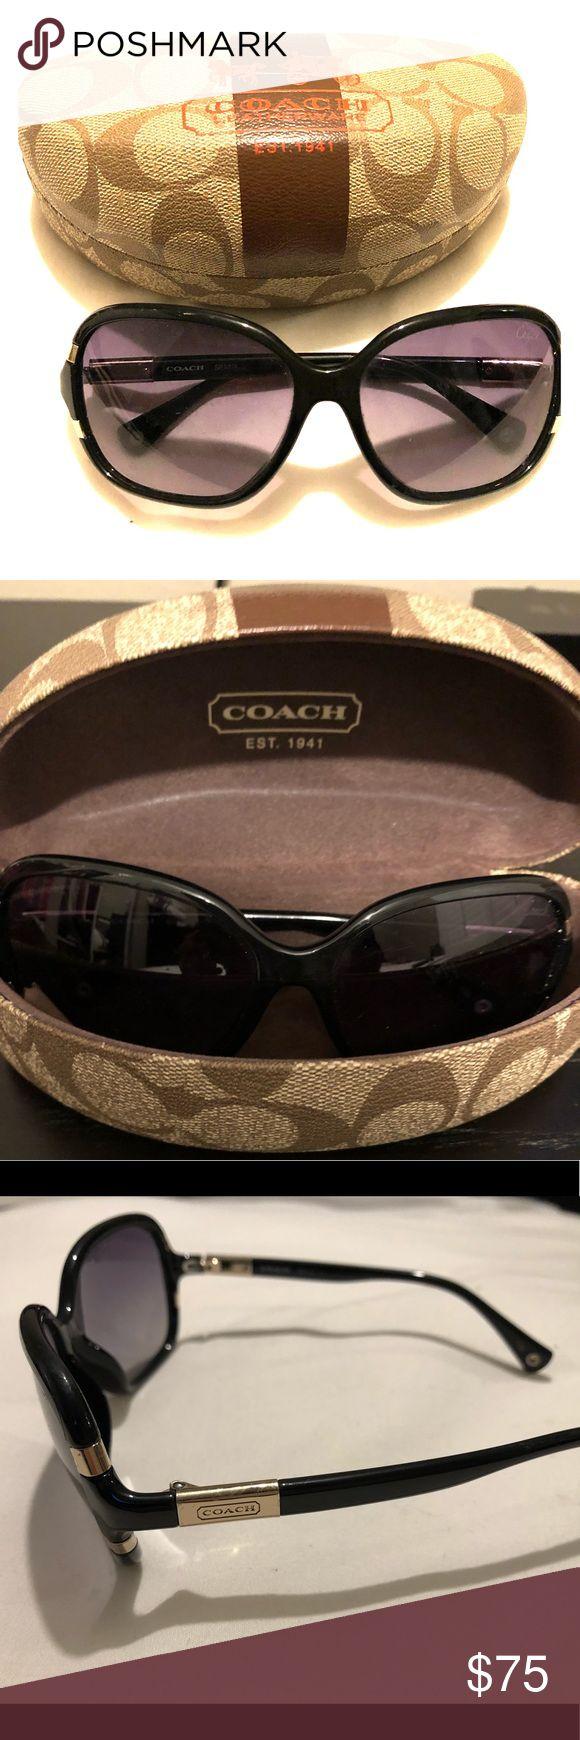 Coach sunglasses Black Coach sunglasses like new. In great condition with original case. Coach Accessories Sunglasses